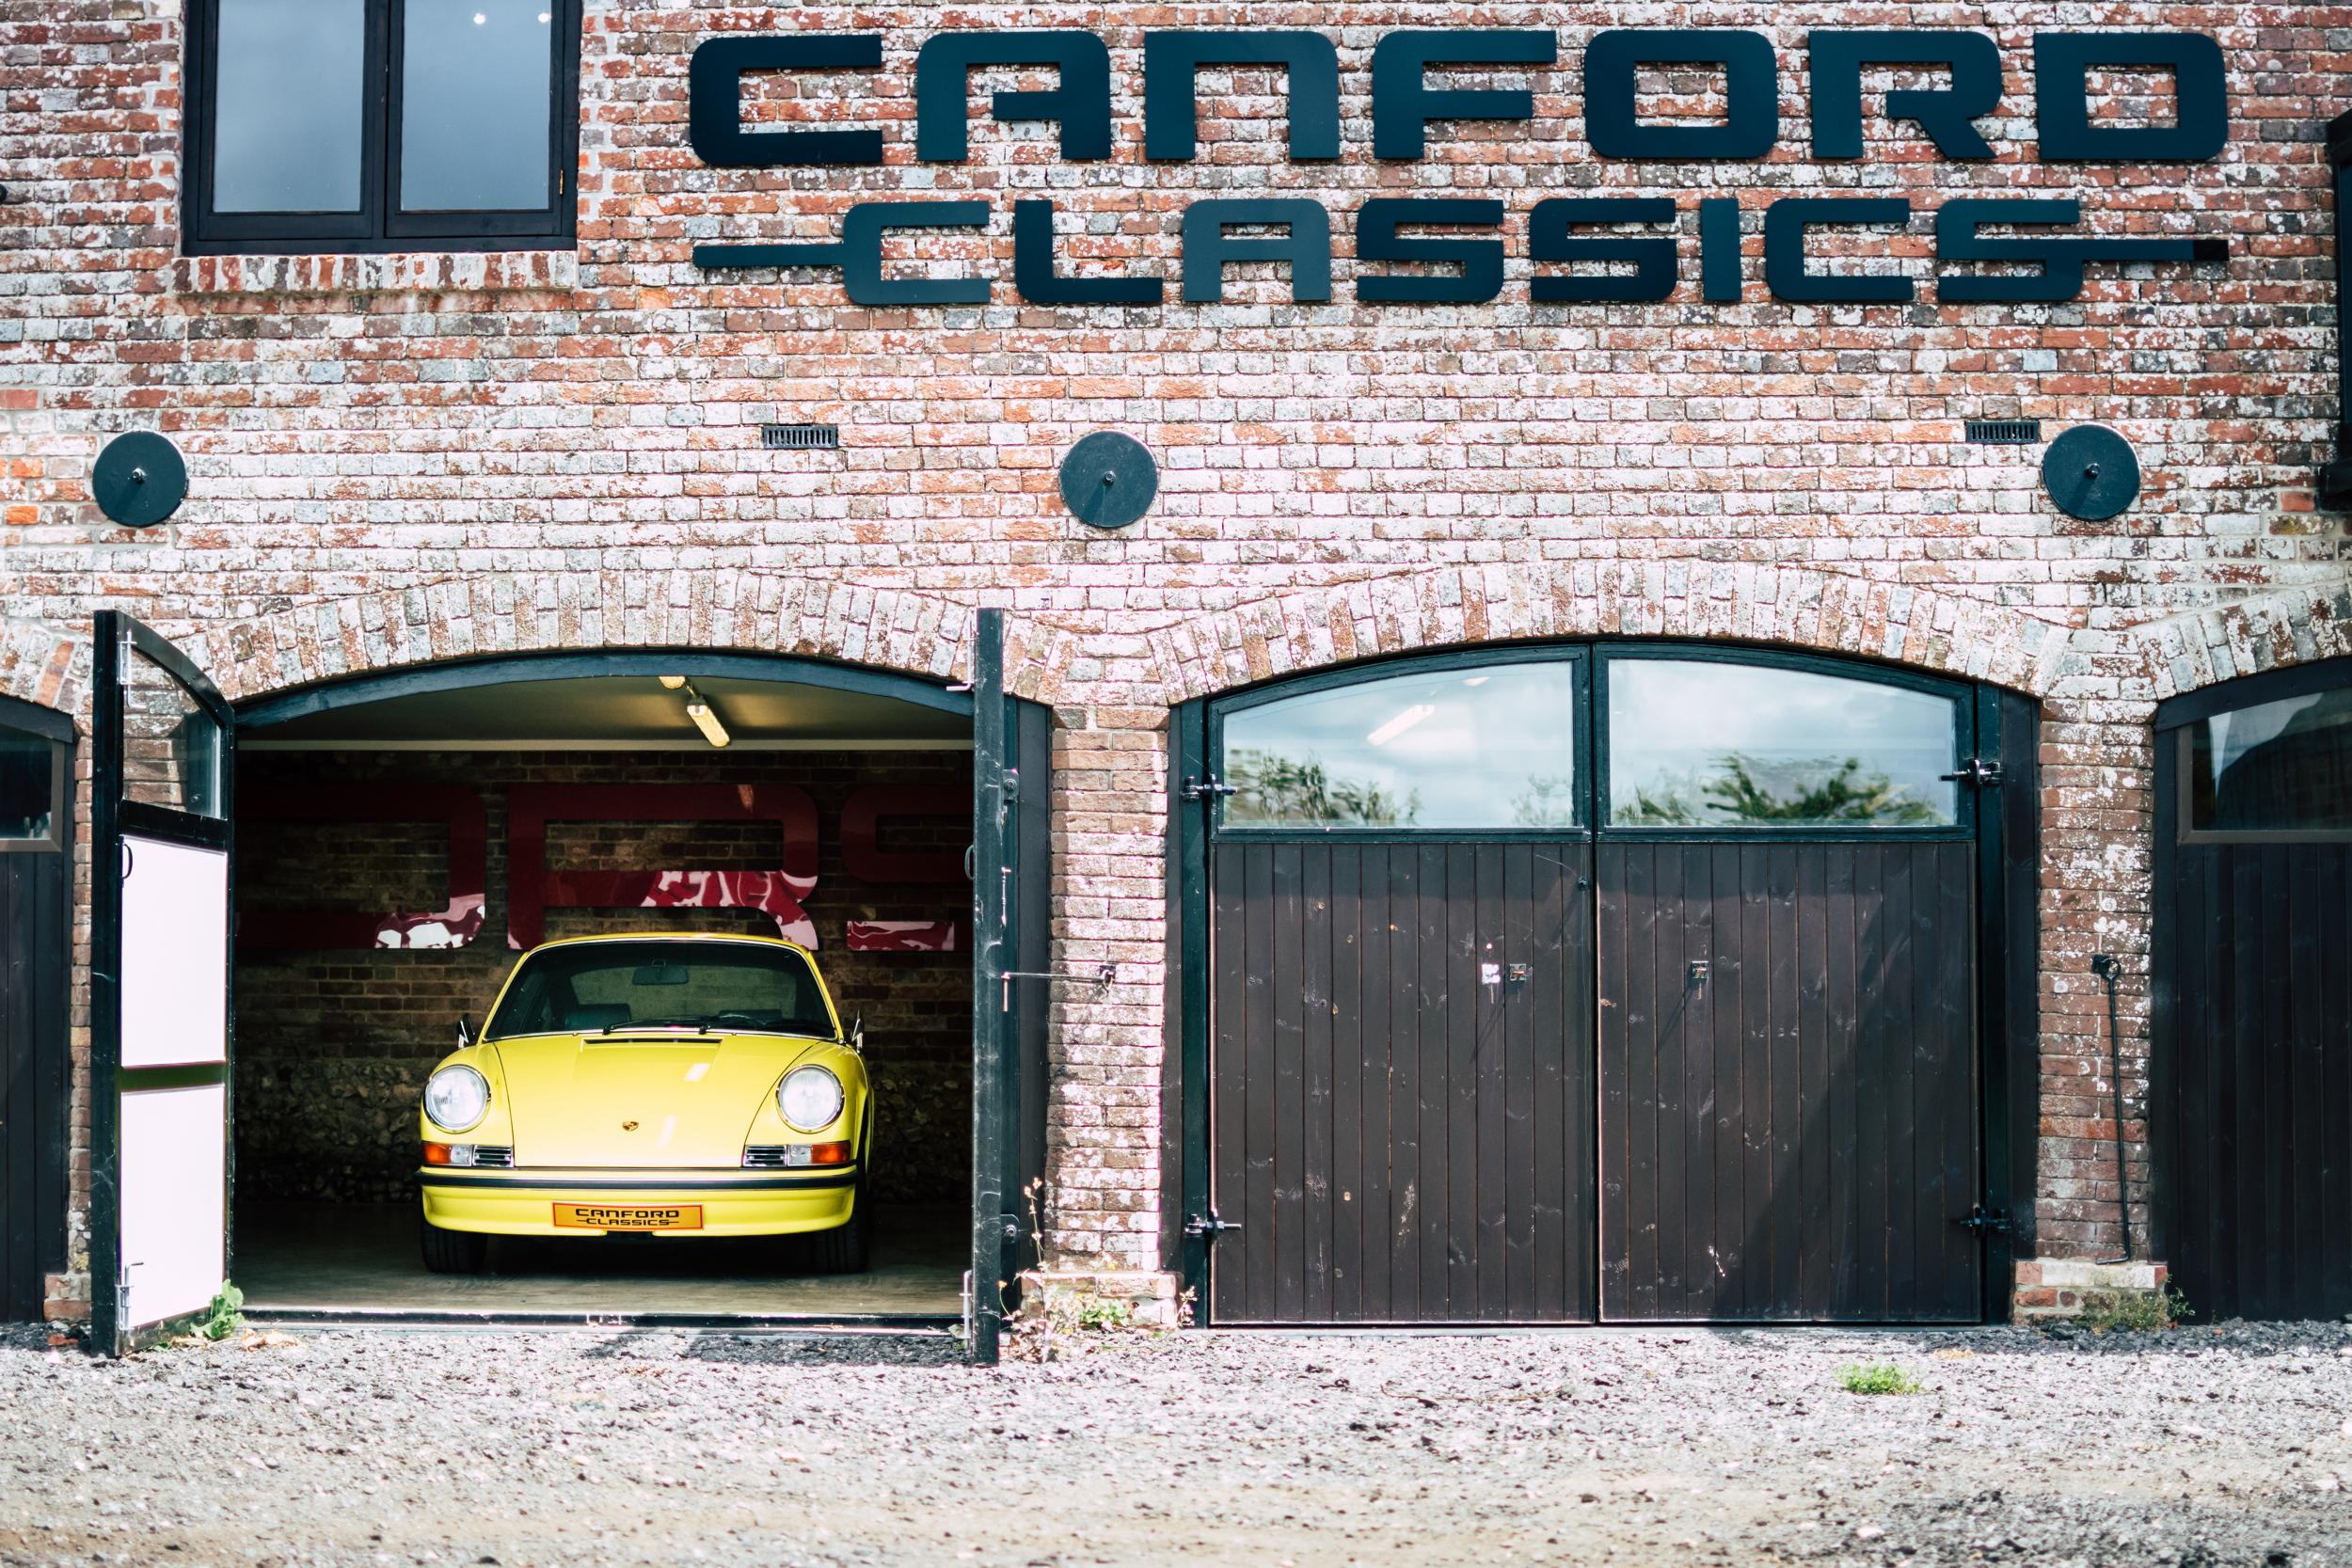 Canford Classics